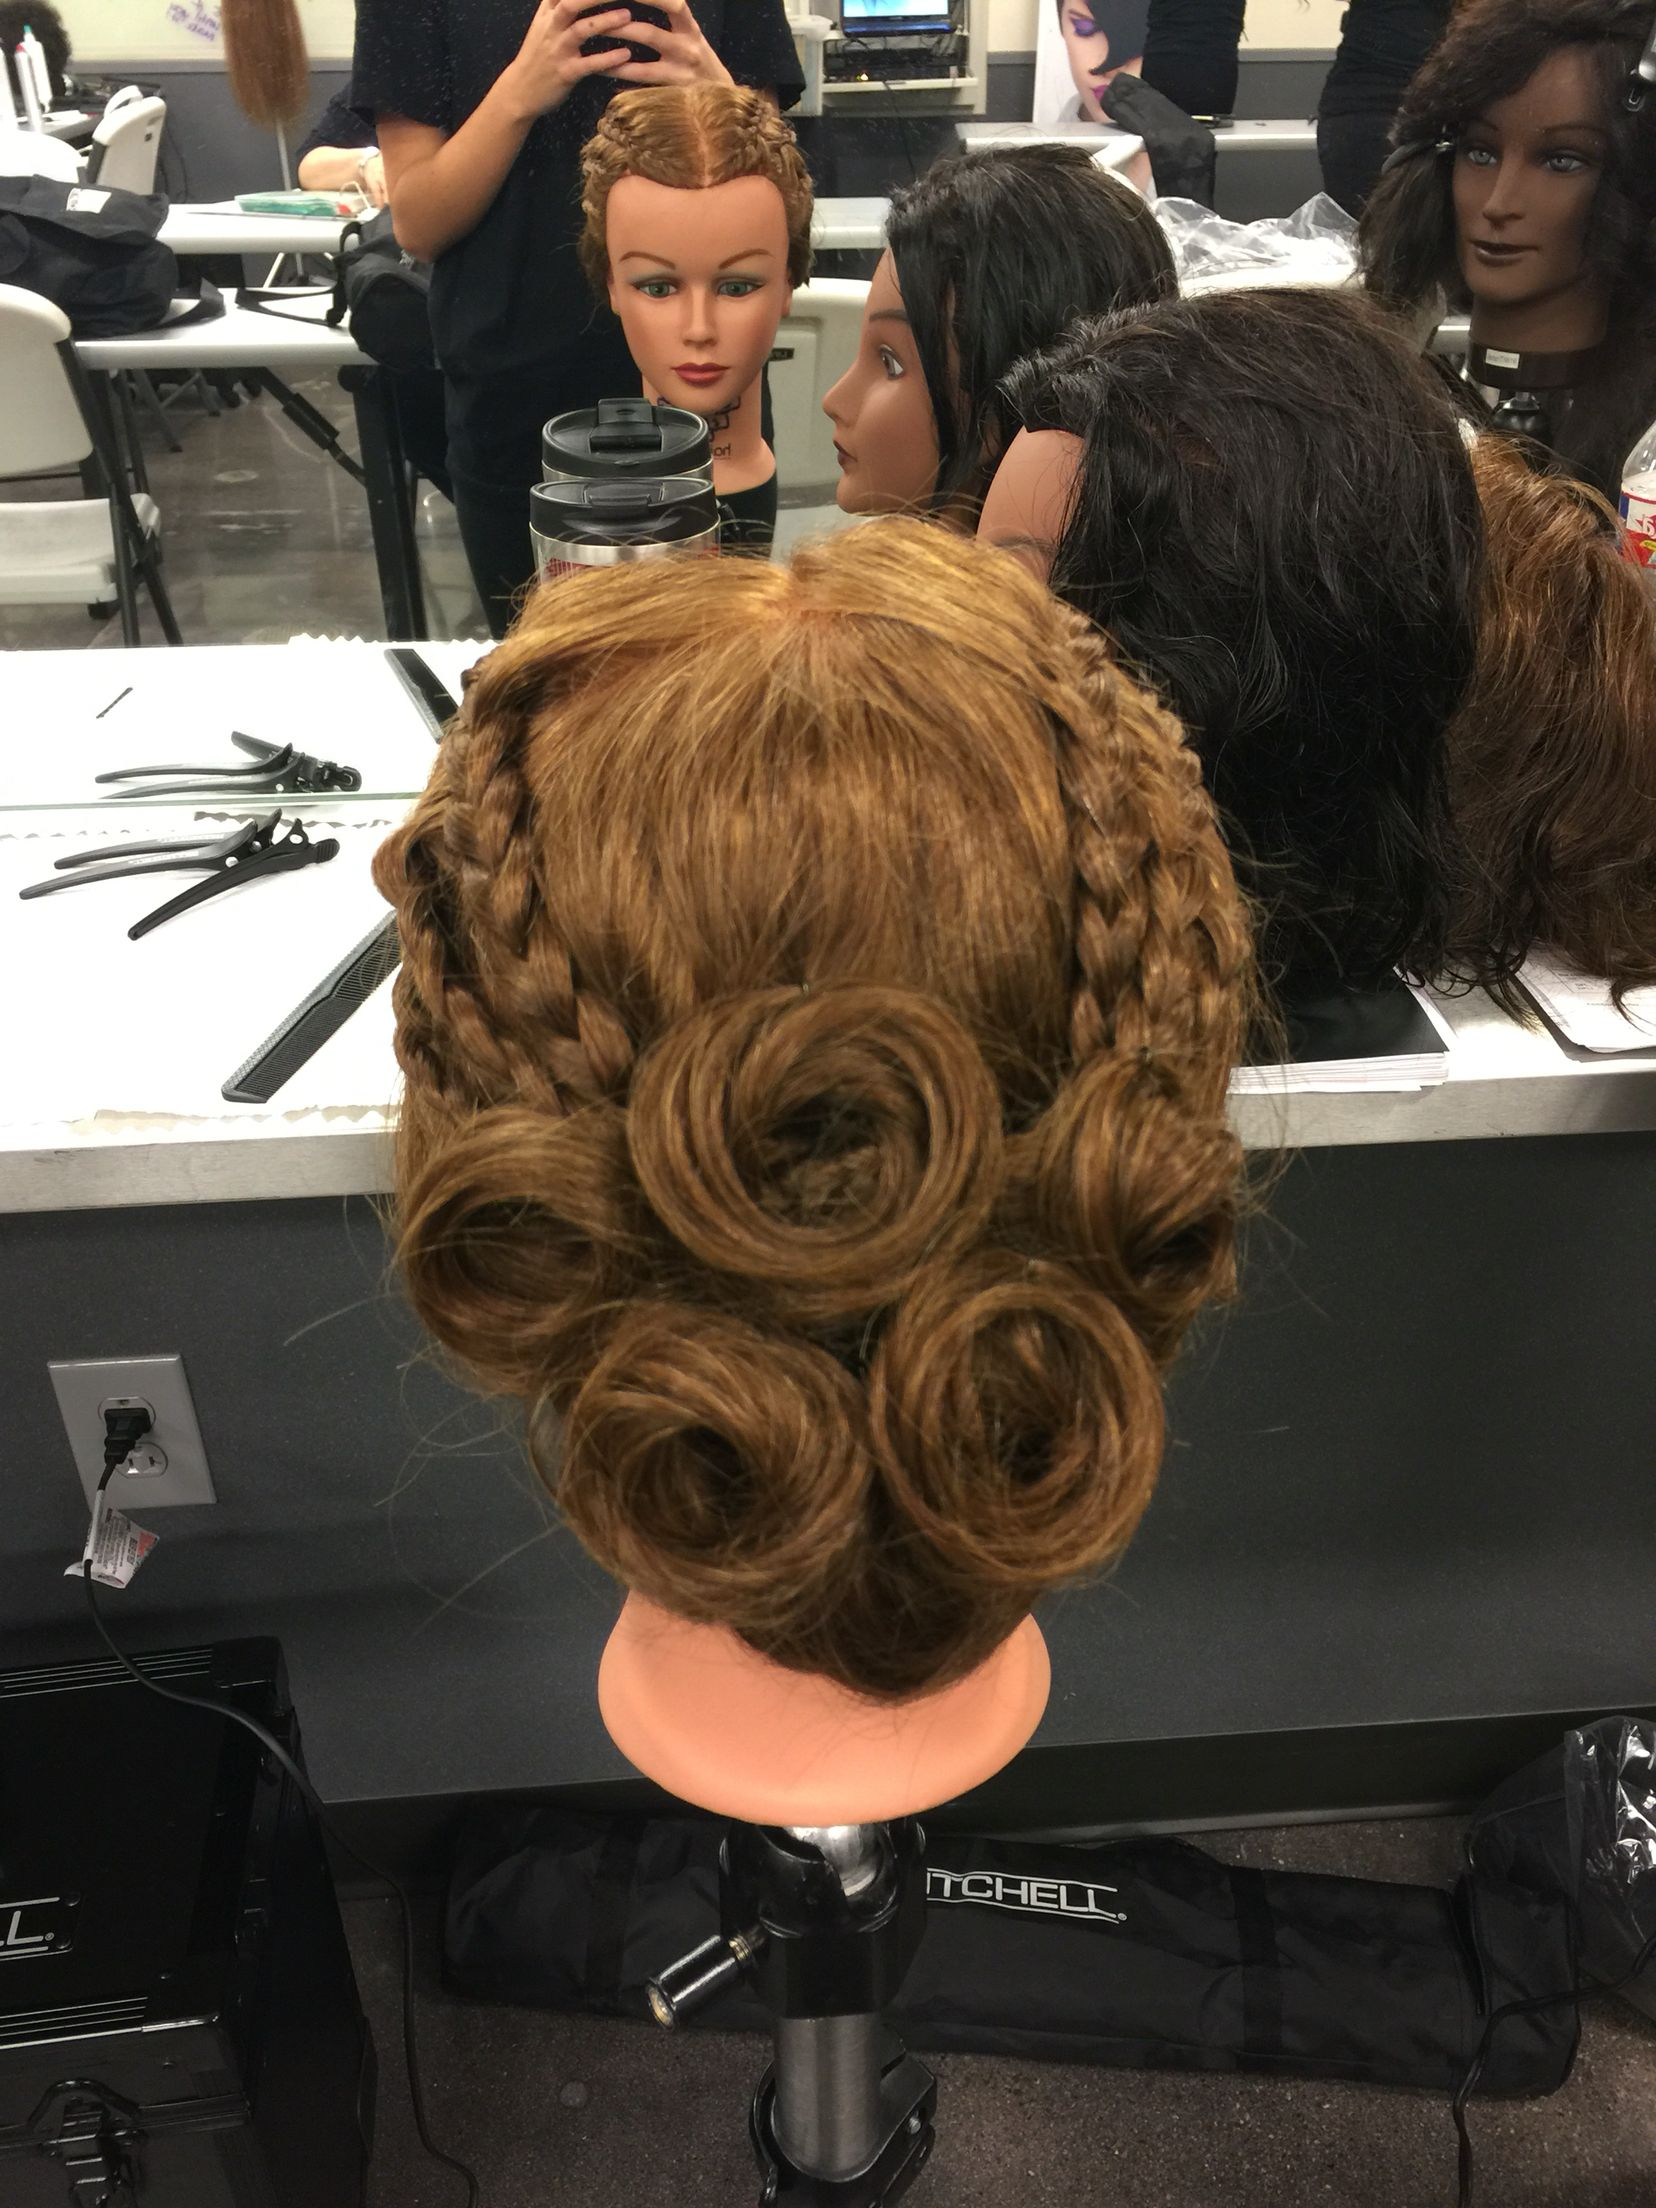 Updo, wedding hair, pin curls, braids